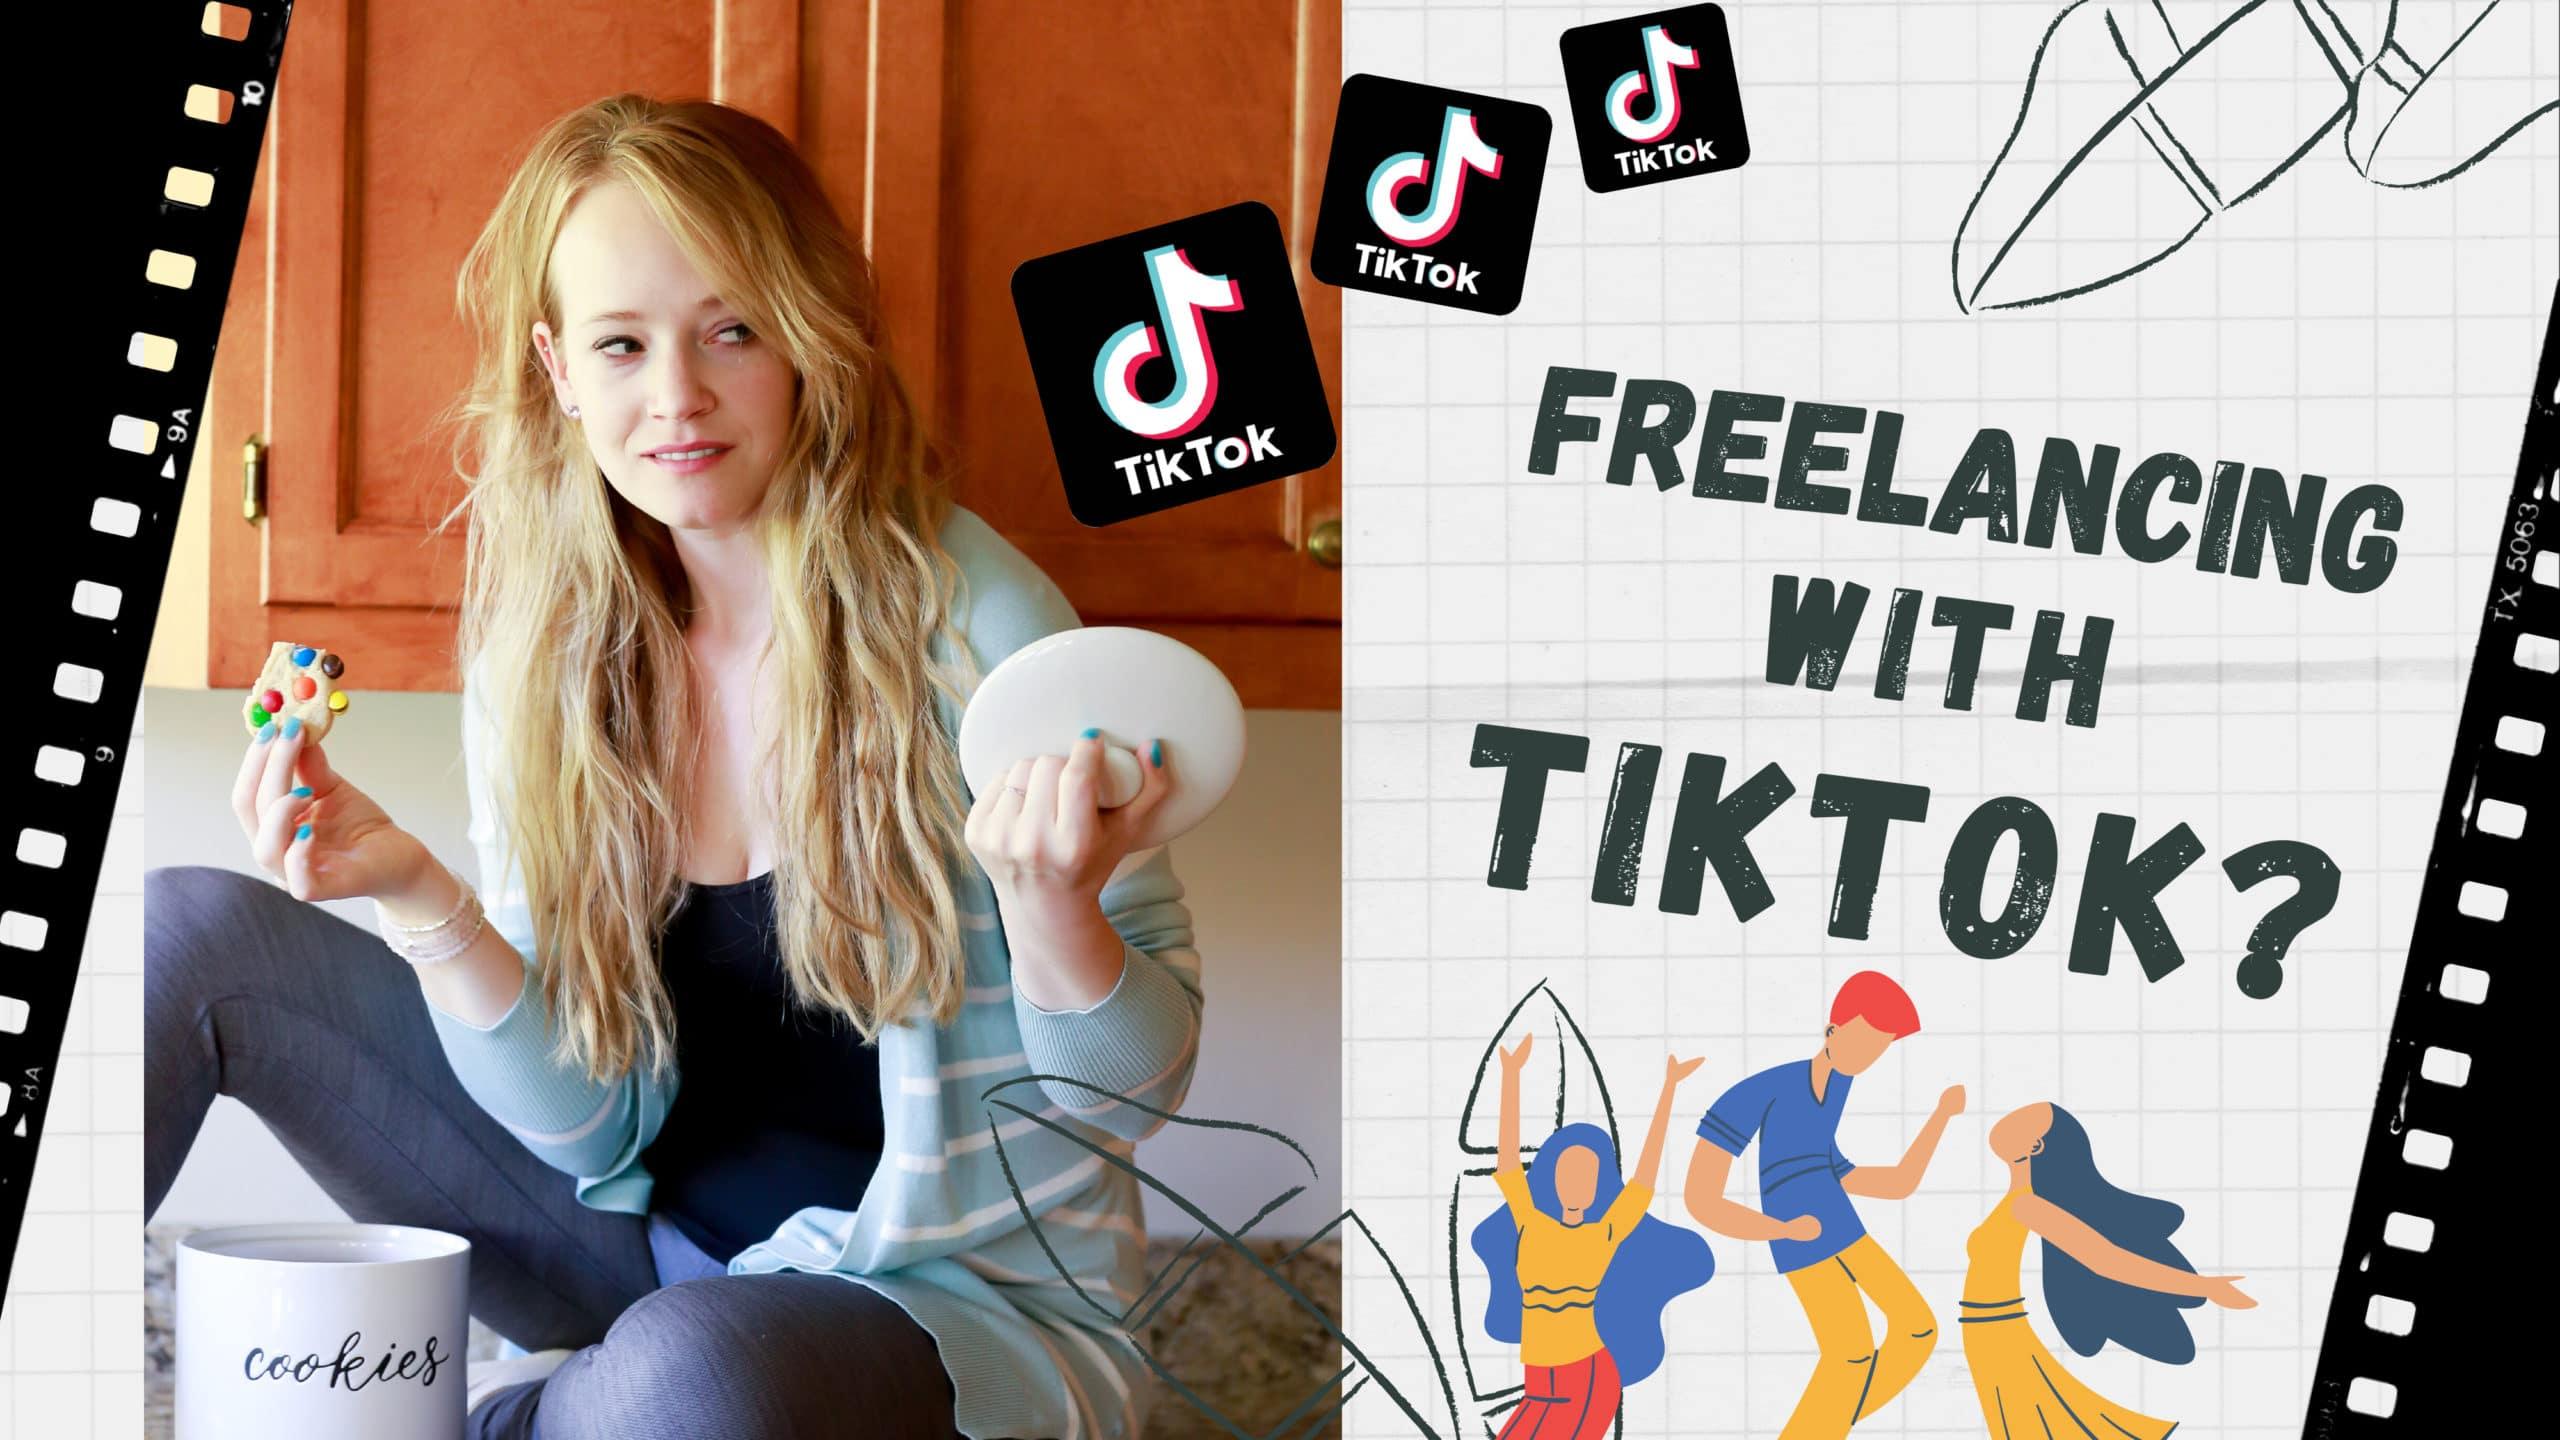 How to Use TikTok as a Service Provider (Freelancer)